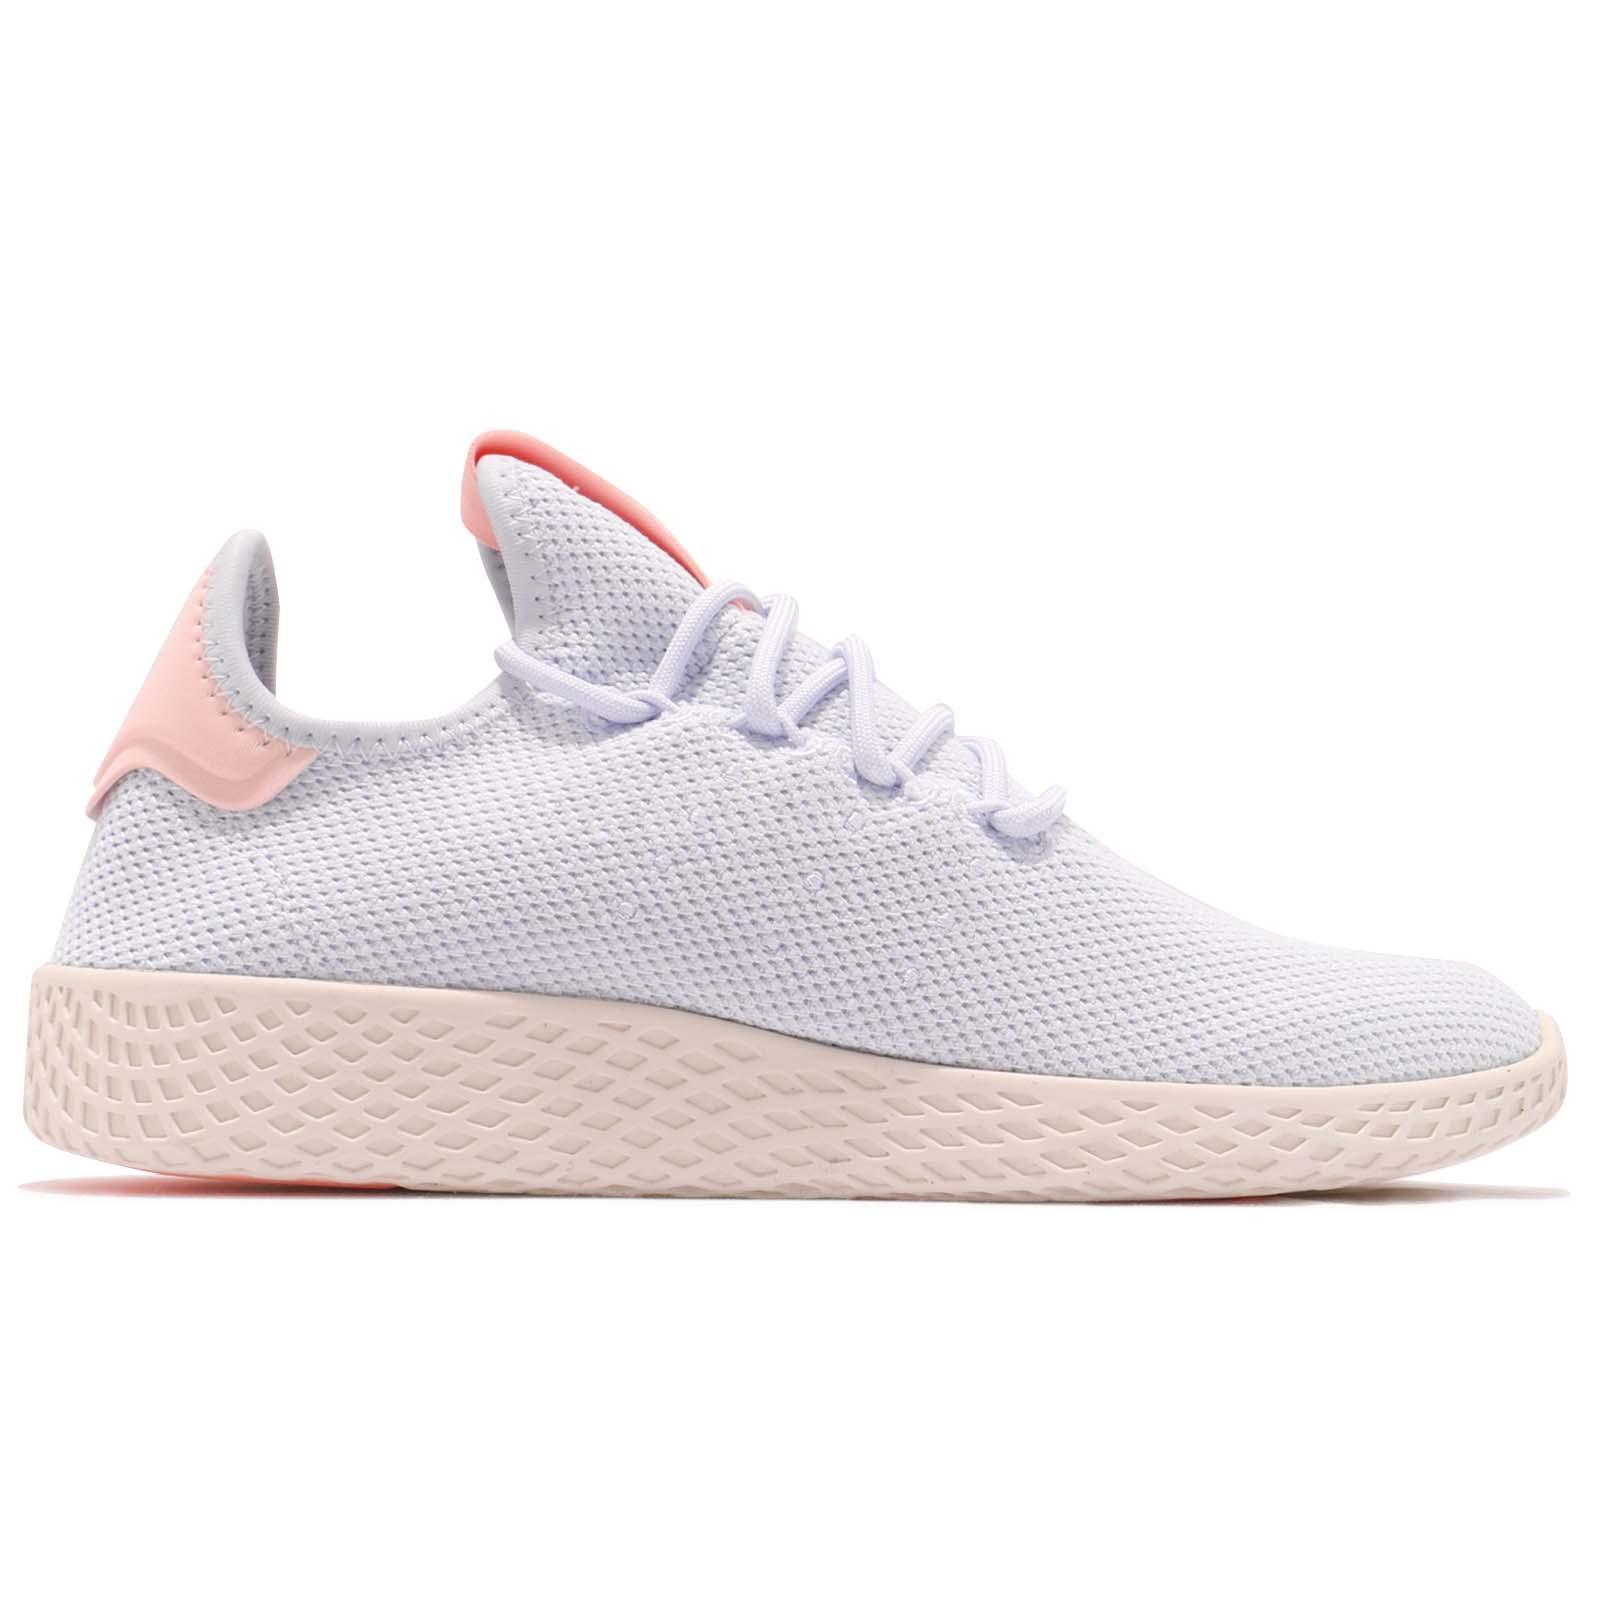 8f21c6228 adidas Originals PW Tennis Hu W Pharrell Williams Aero Blue Pink ...